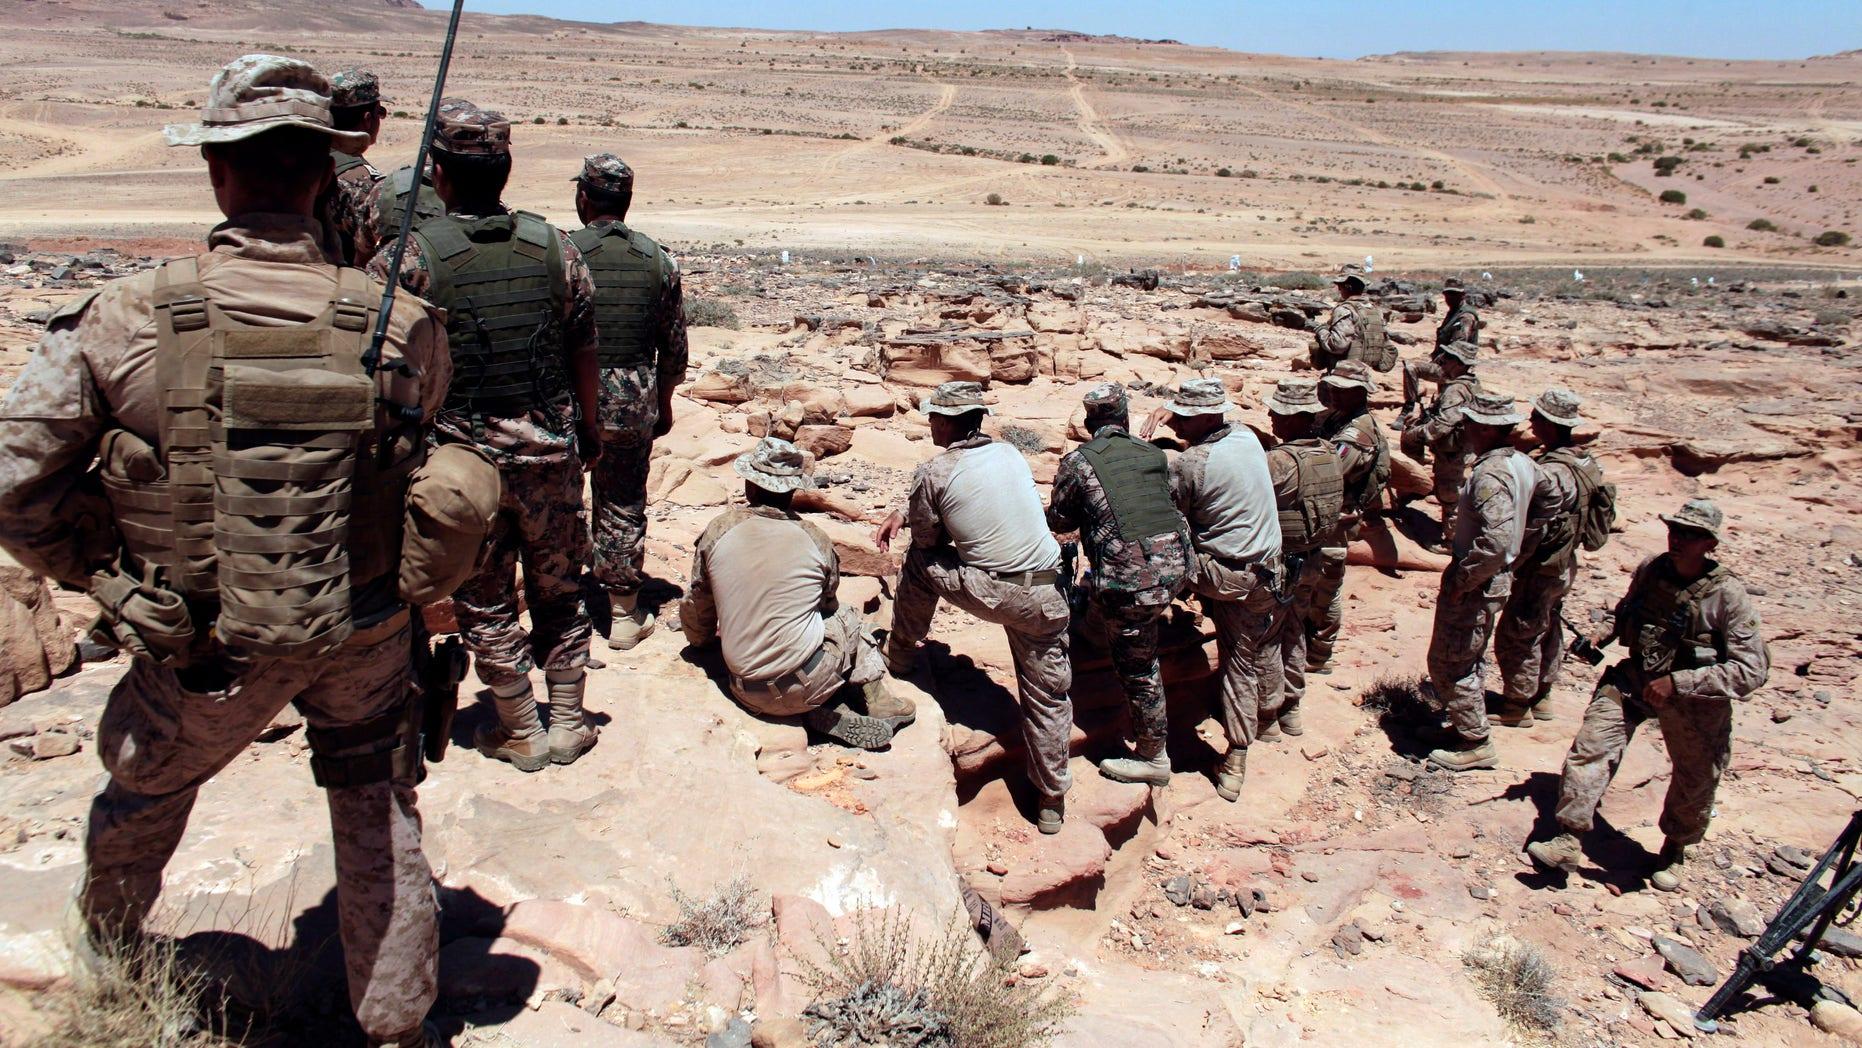 In this June 18, 2013, file photo, U.S. Marines monitor Eager Lion multinational military maneuvers in Quweira, 186 miles south of Amman, Jordan. (AP Photo/Maya Alleruzzo, File)